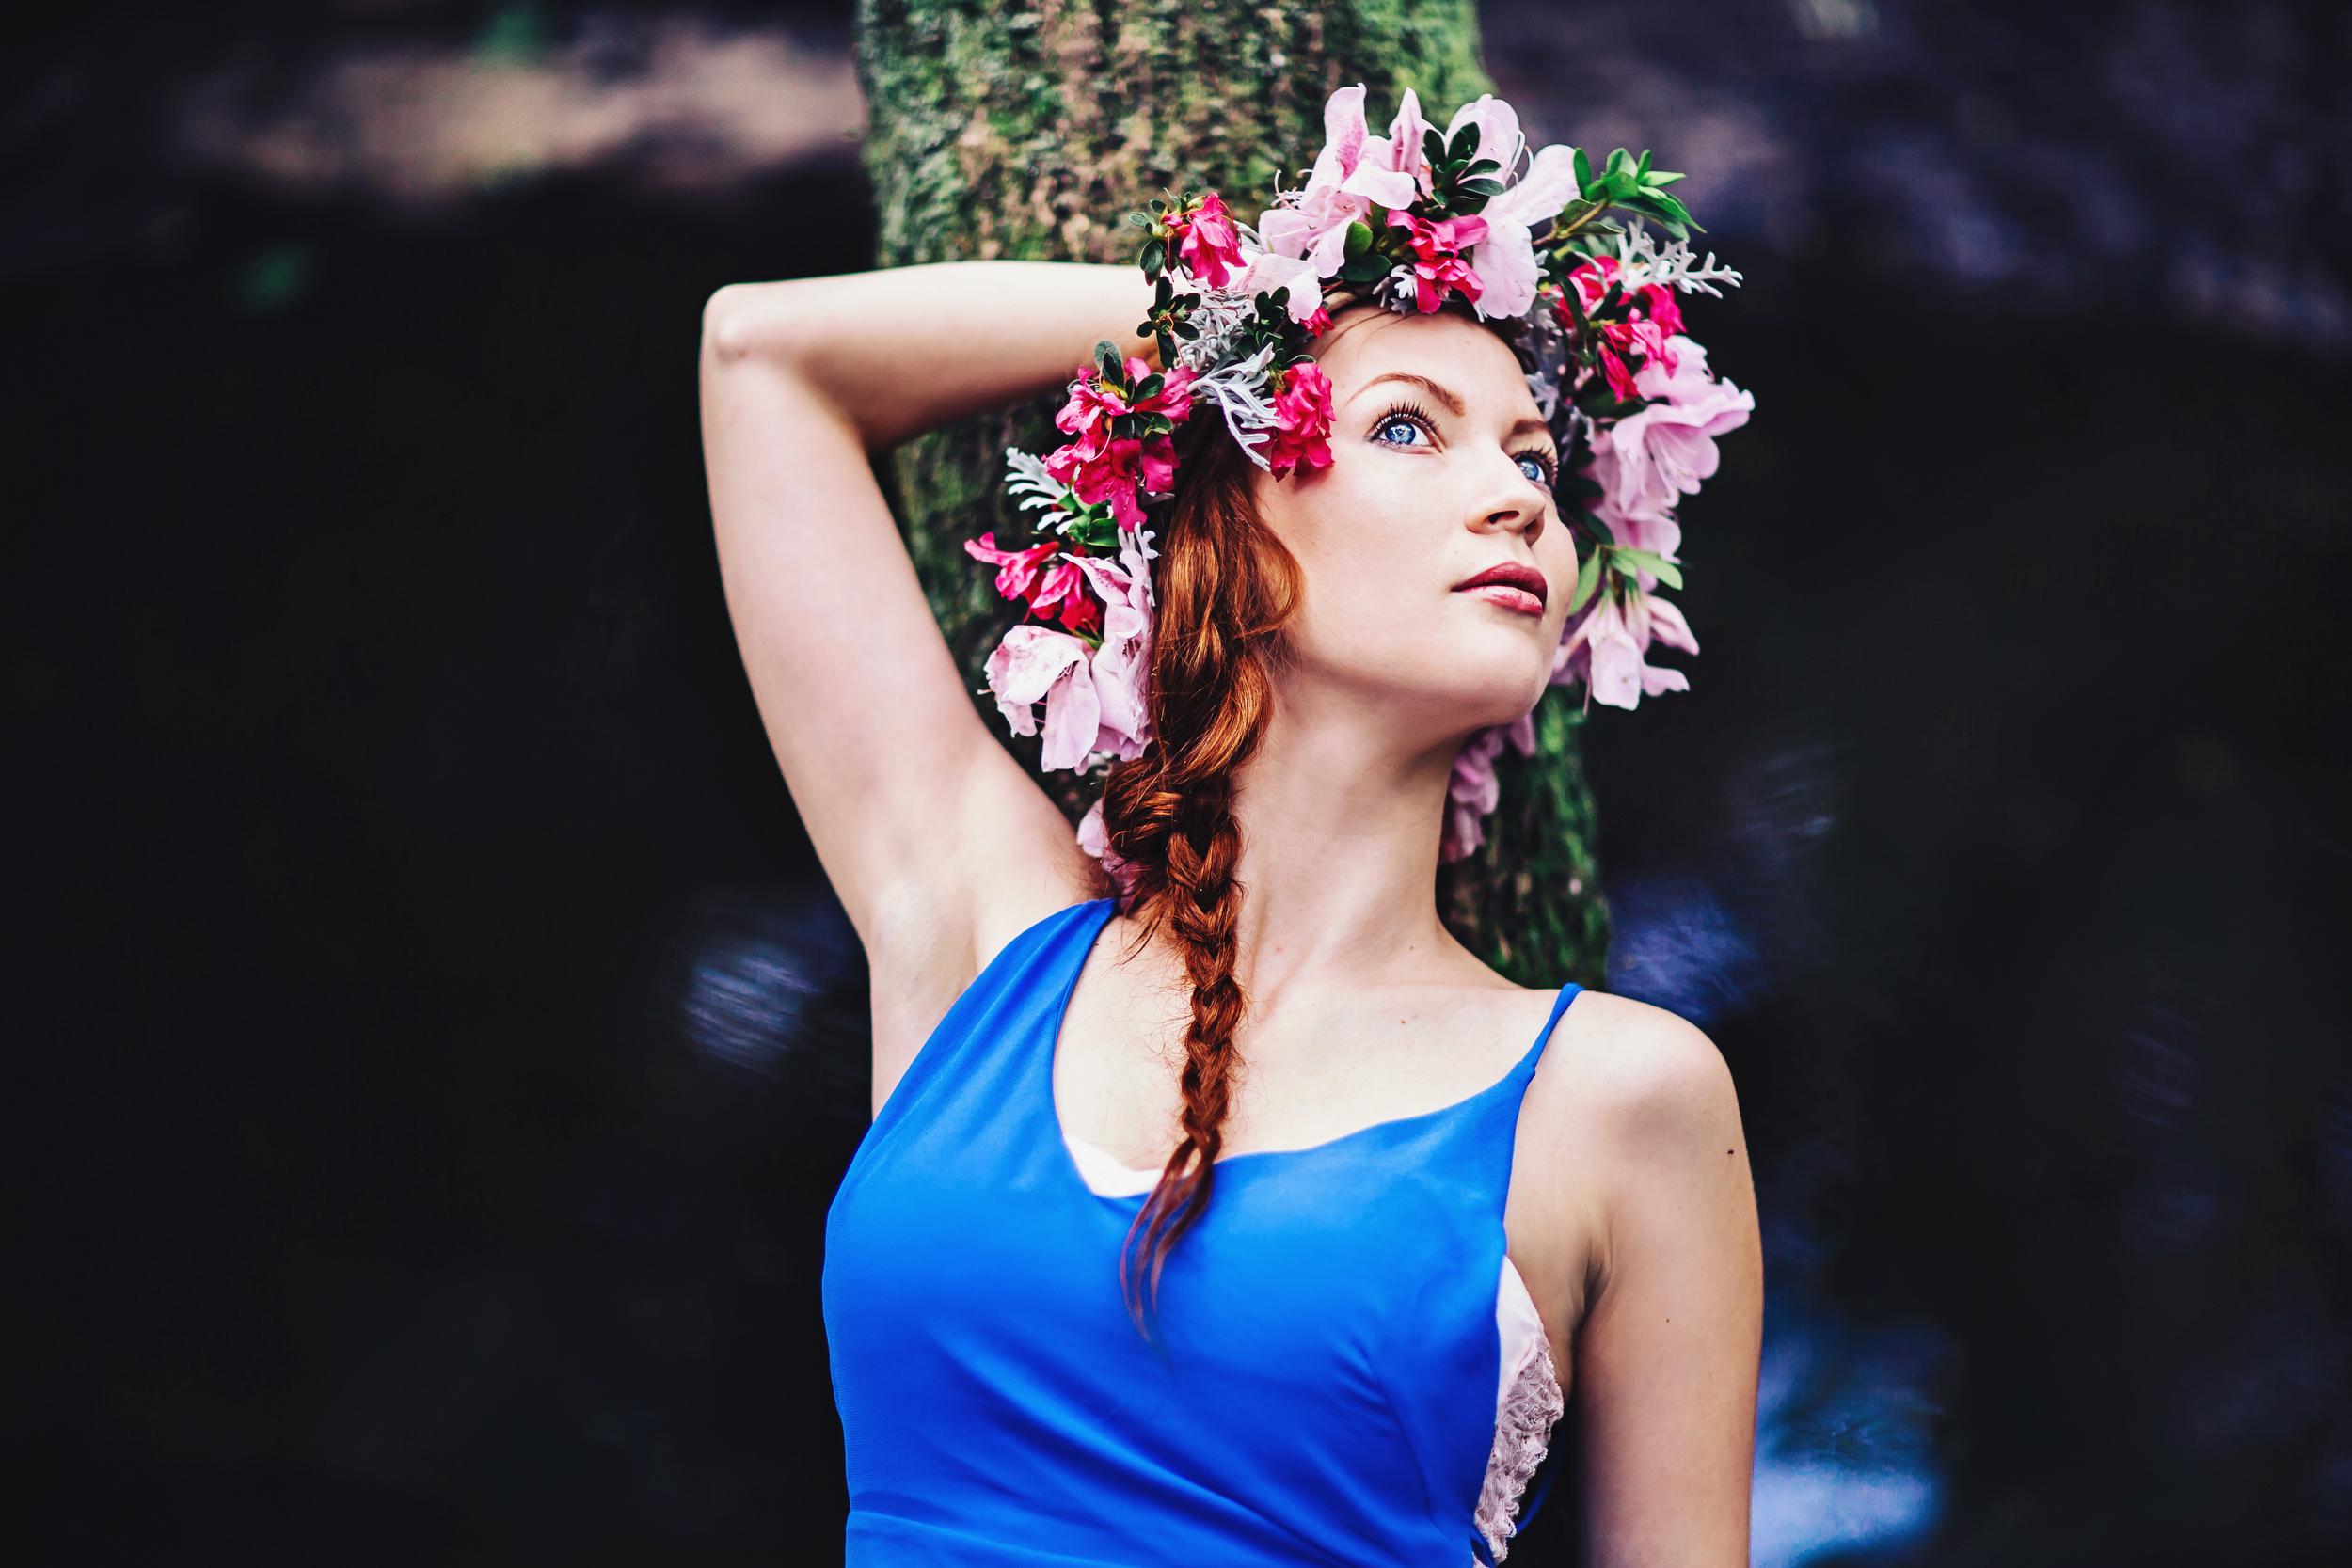 flower crown Sanford style portrait photography organic portrait nature inspired blue dress